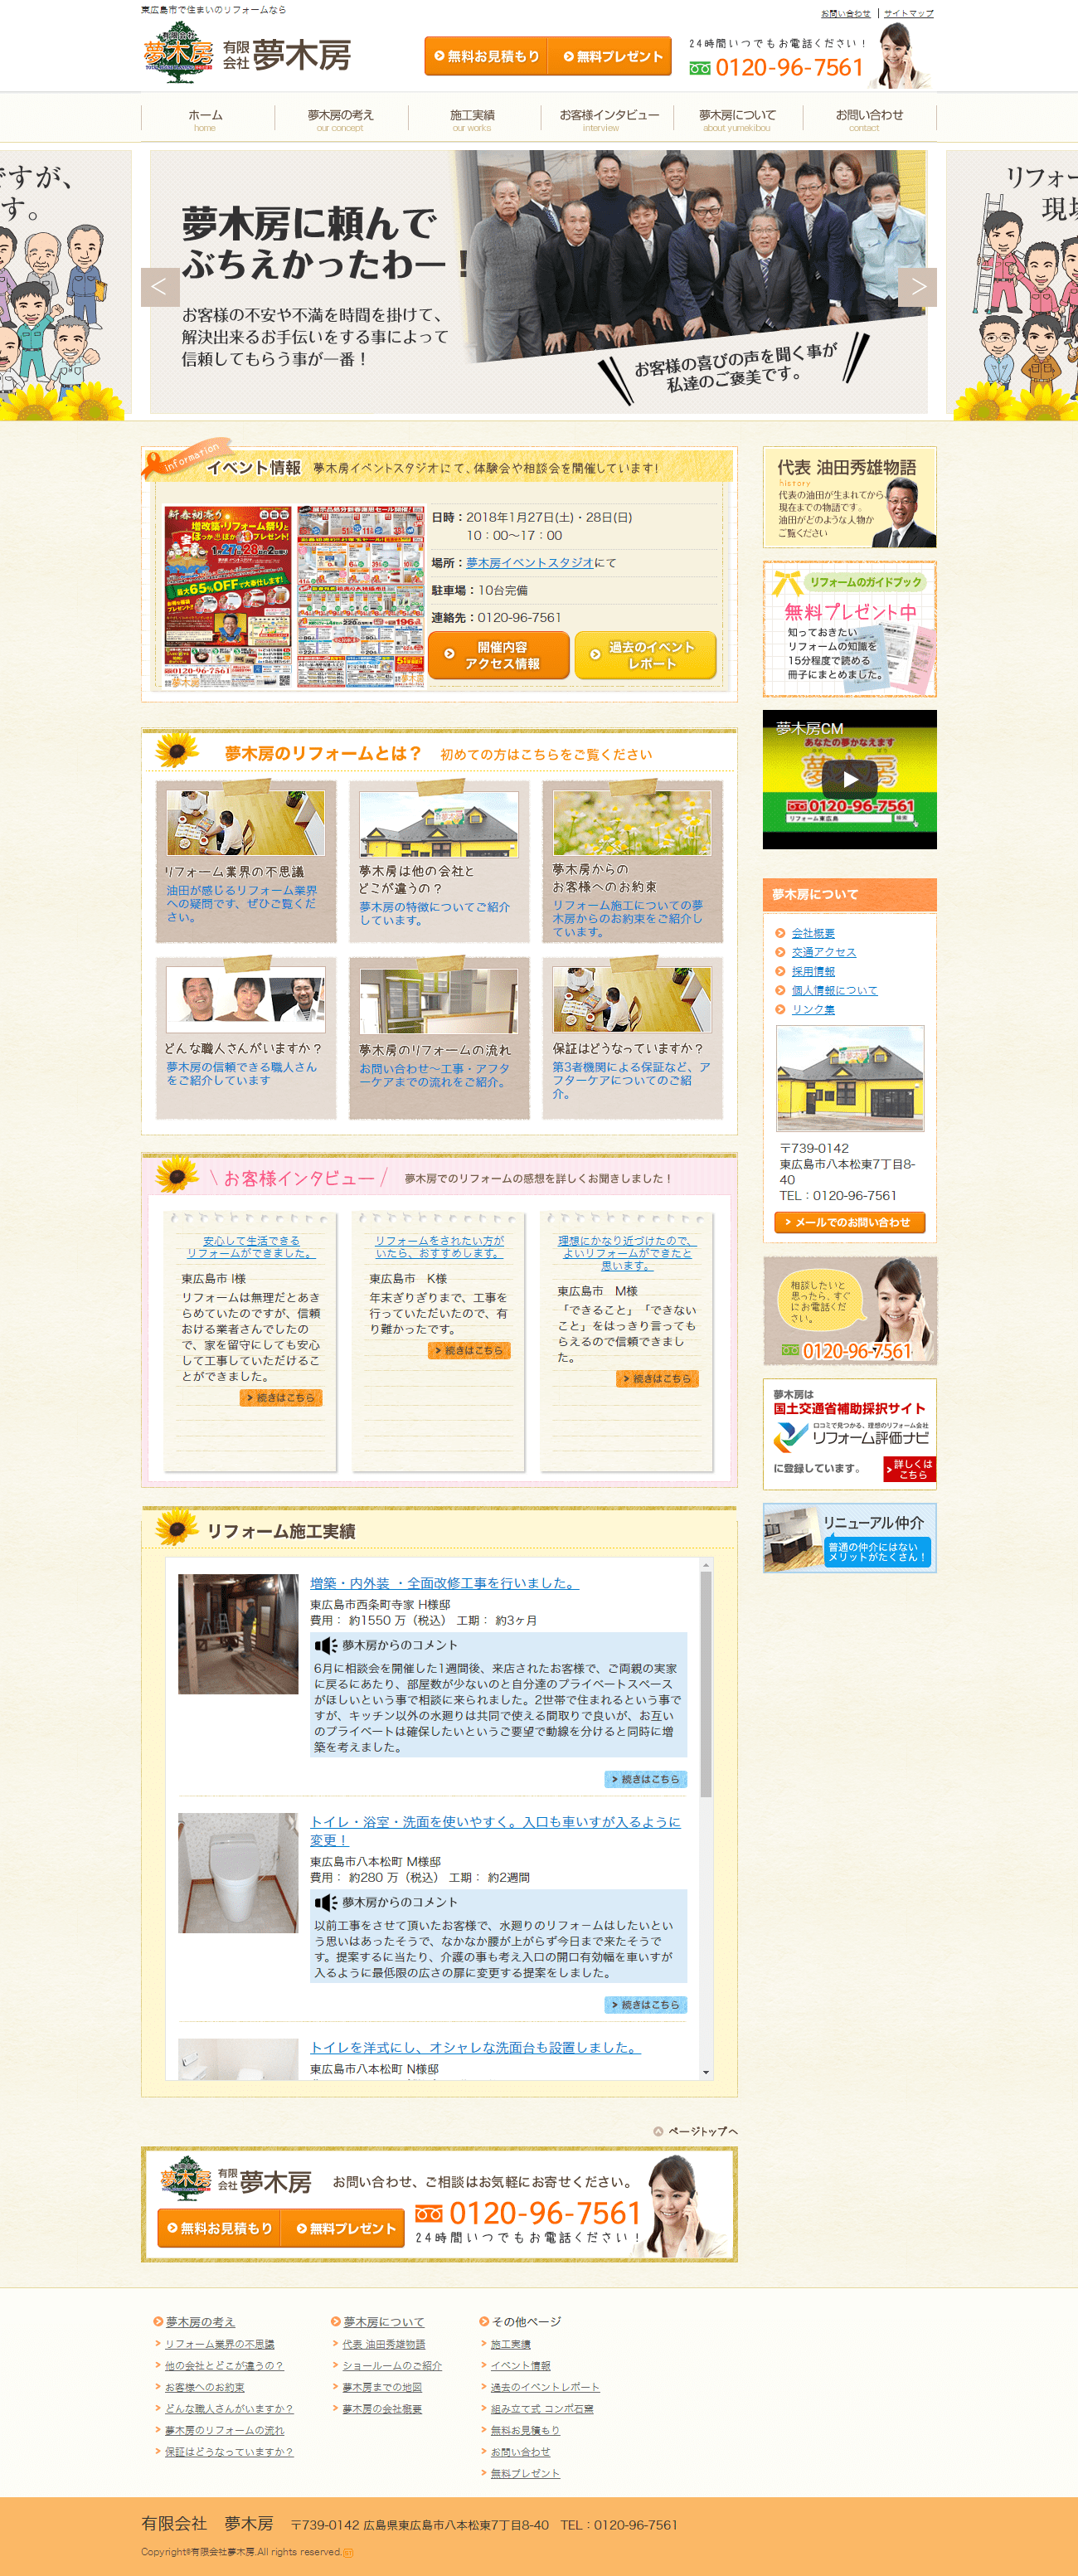 広島県 有限会社 夢木房様 ホームページ制作1